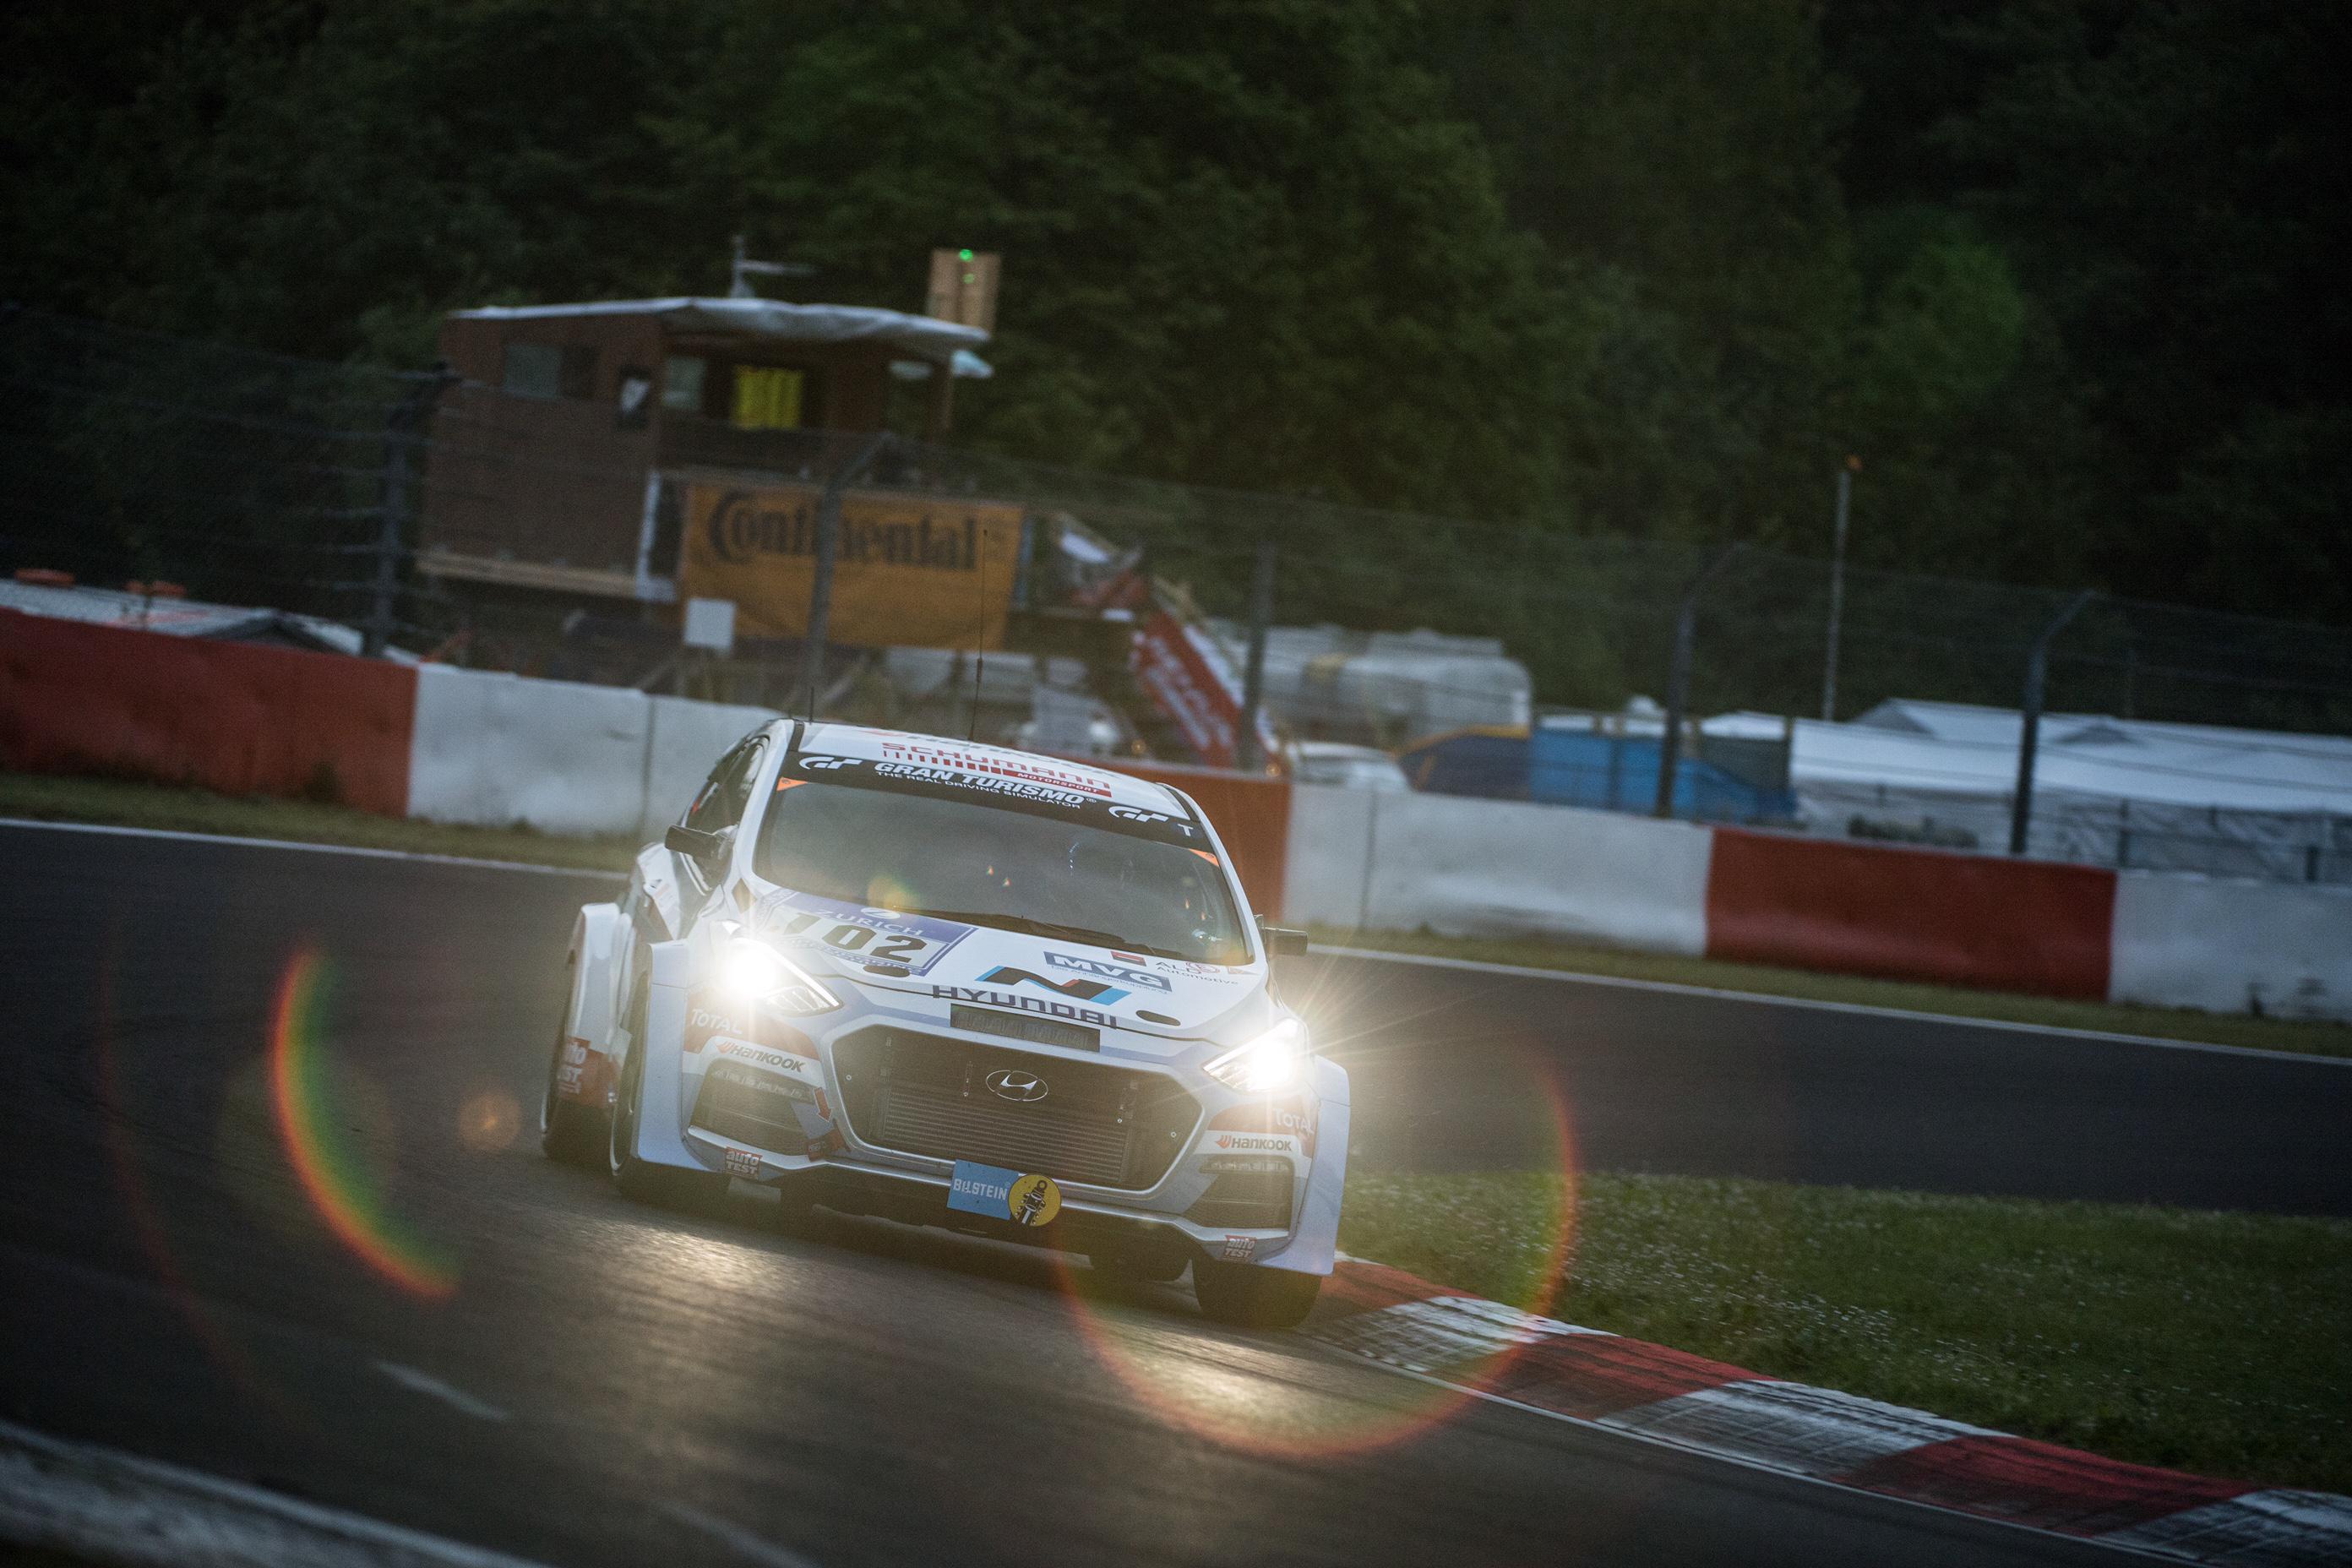 Hyundai i30 N 2.0L Turbo development car completes gruelling Nürburgring 24h Race